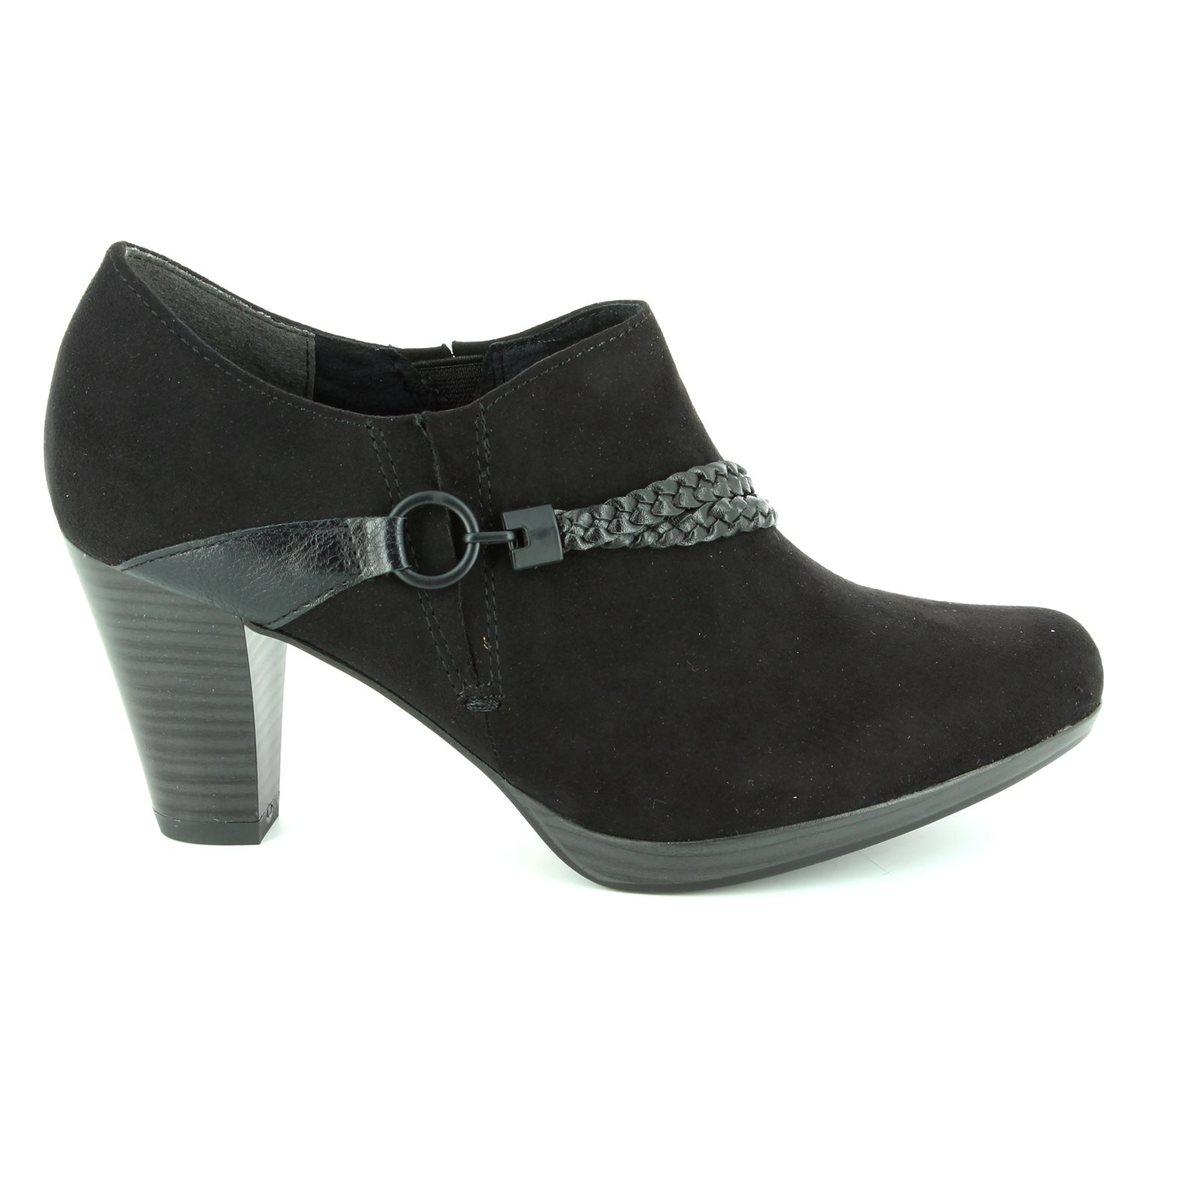 marco tozzi senagoza 24408 098 black shoe boots. Black Bedroom Furniture Sets. Home Design Ideas